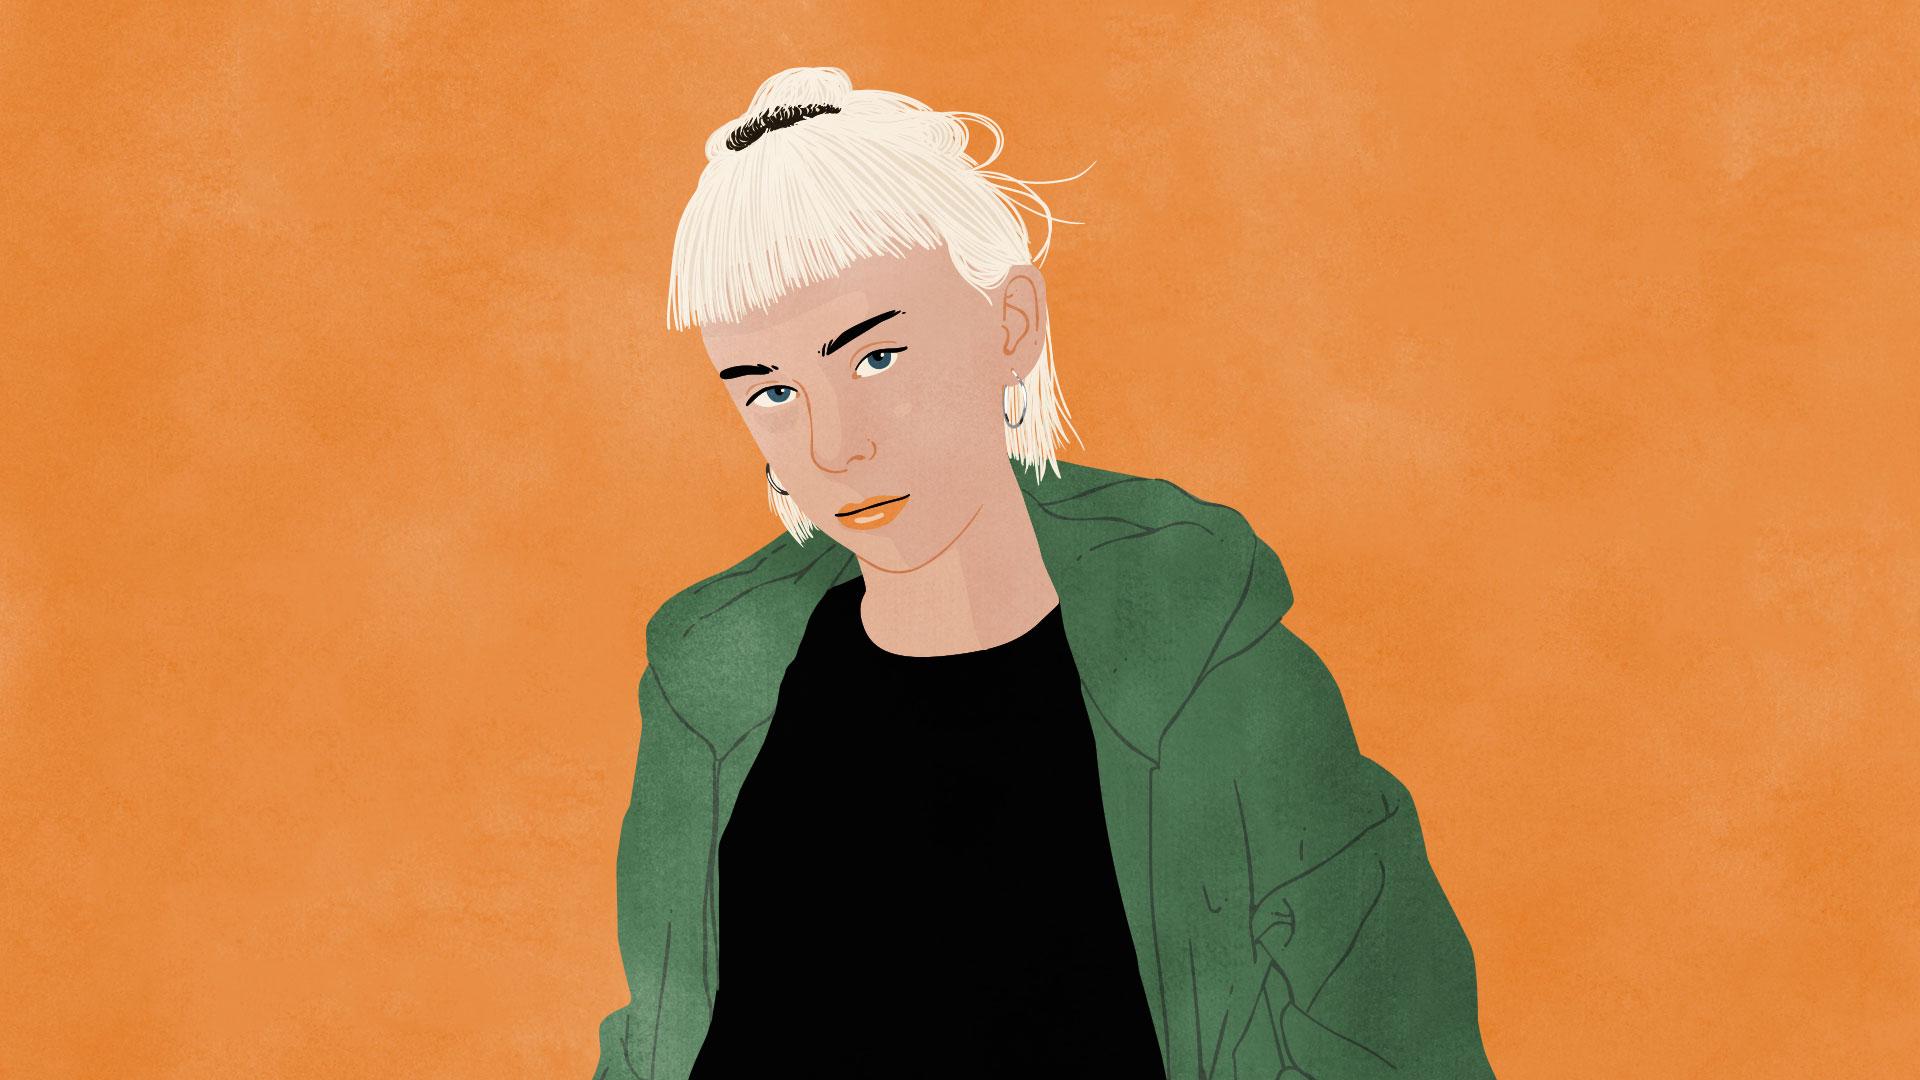 Elise-by-Olsen].jpg